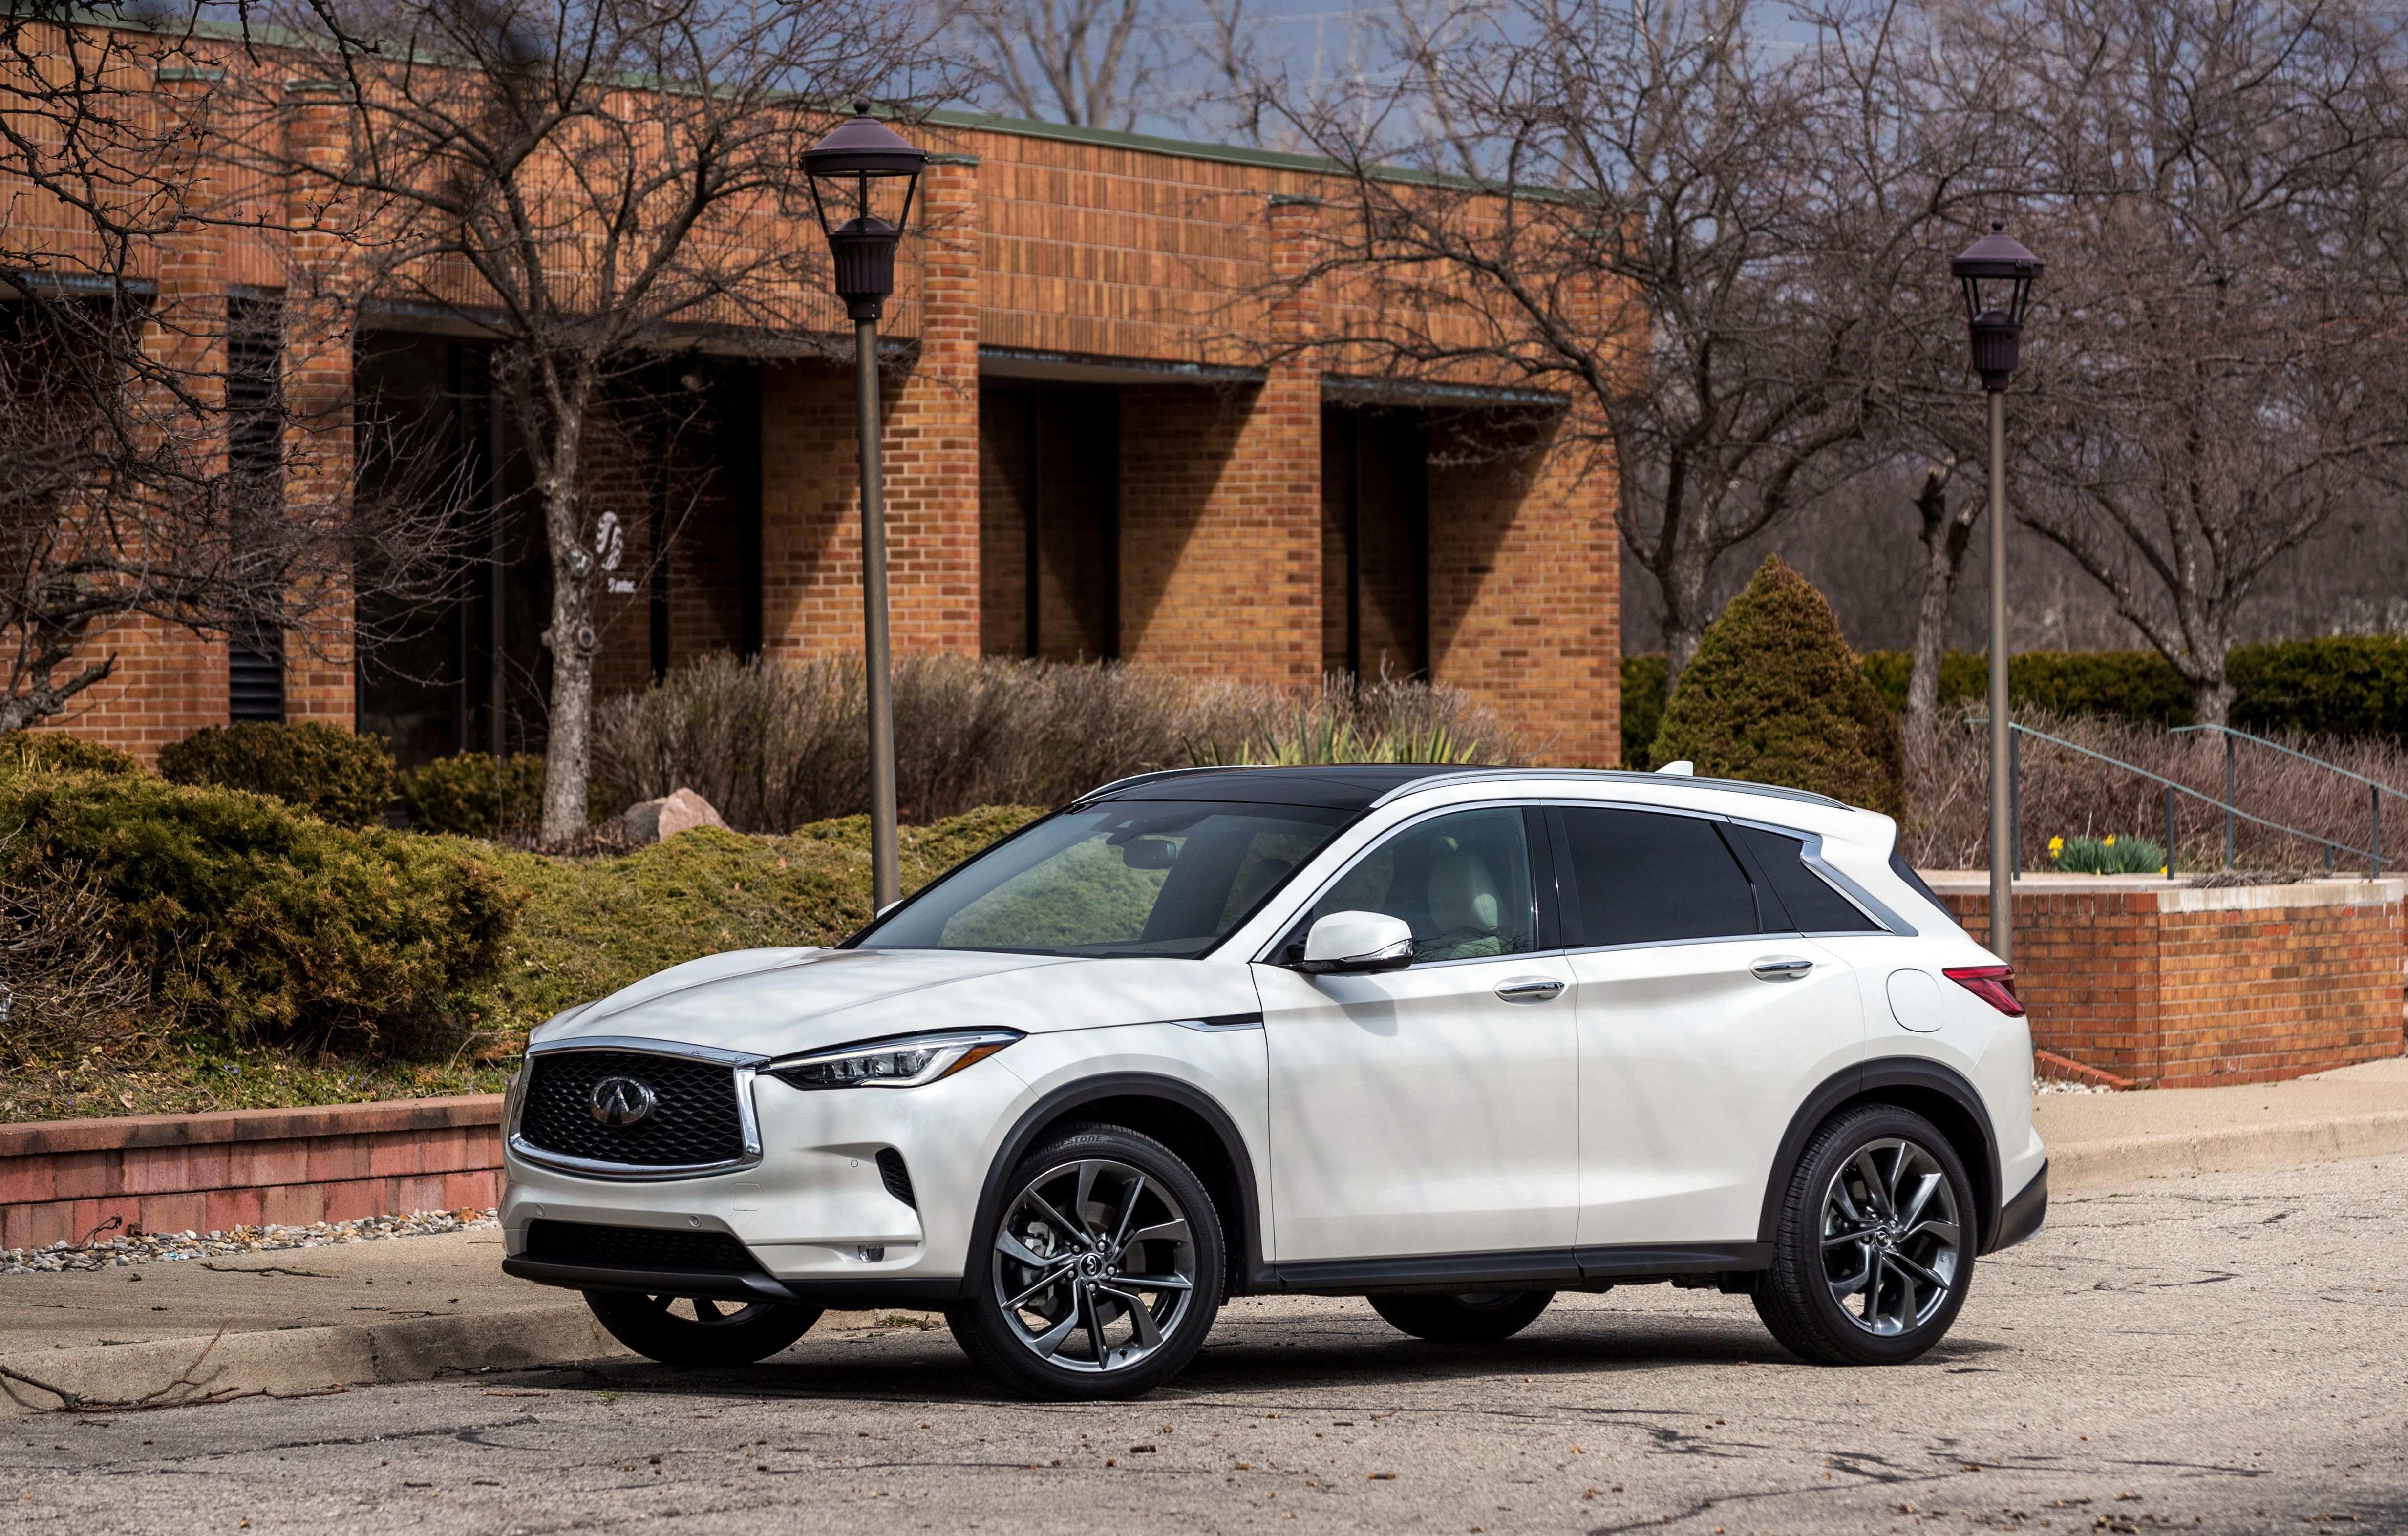 55 Great New 2019 Infiniti Qx50 Fuel Economy Review Spesification with New 2019 Infiniti Qx50 Fuel Economy Review